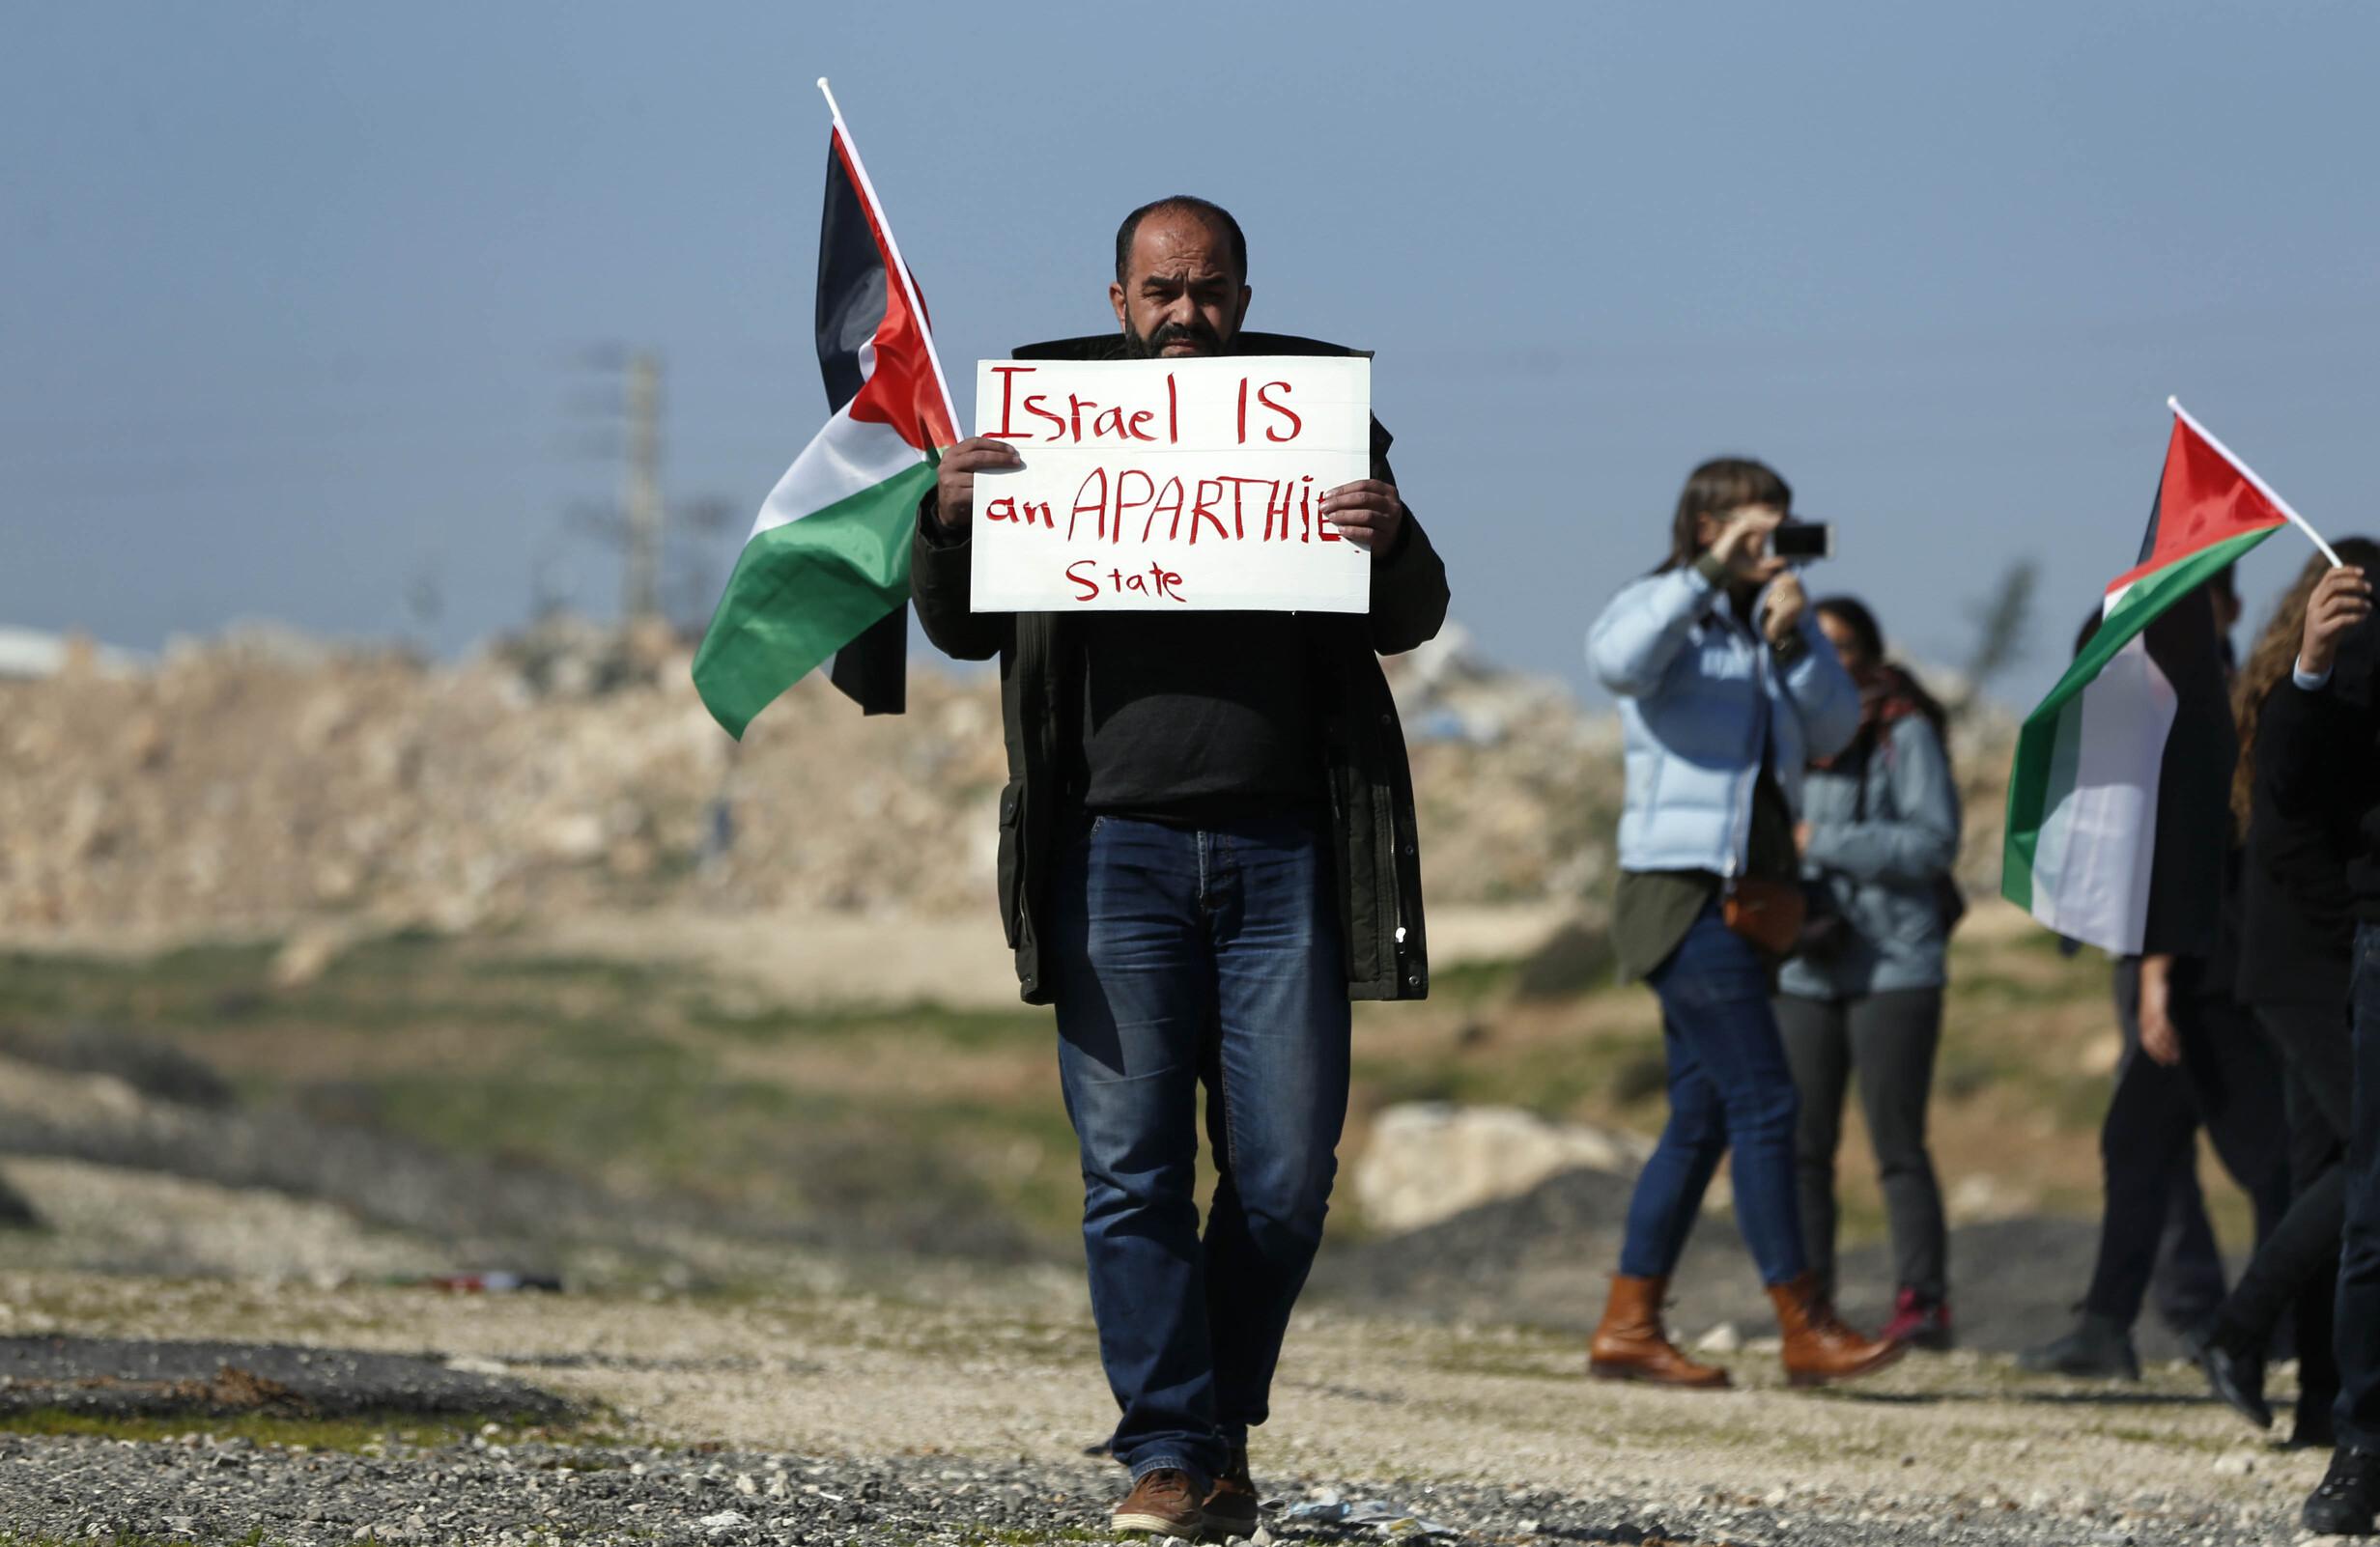 Israel Palestine and Apartheid